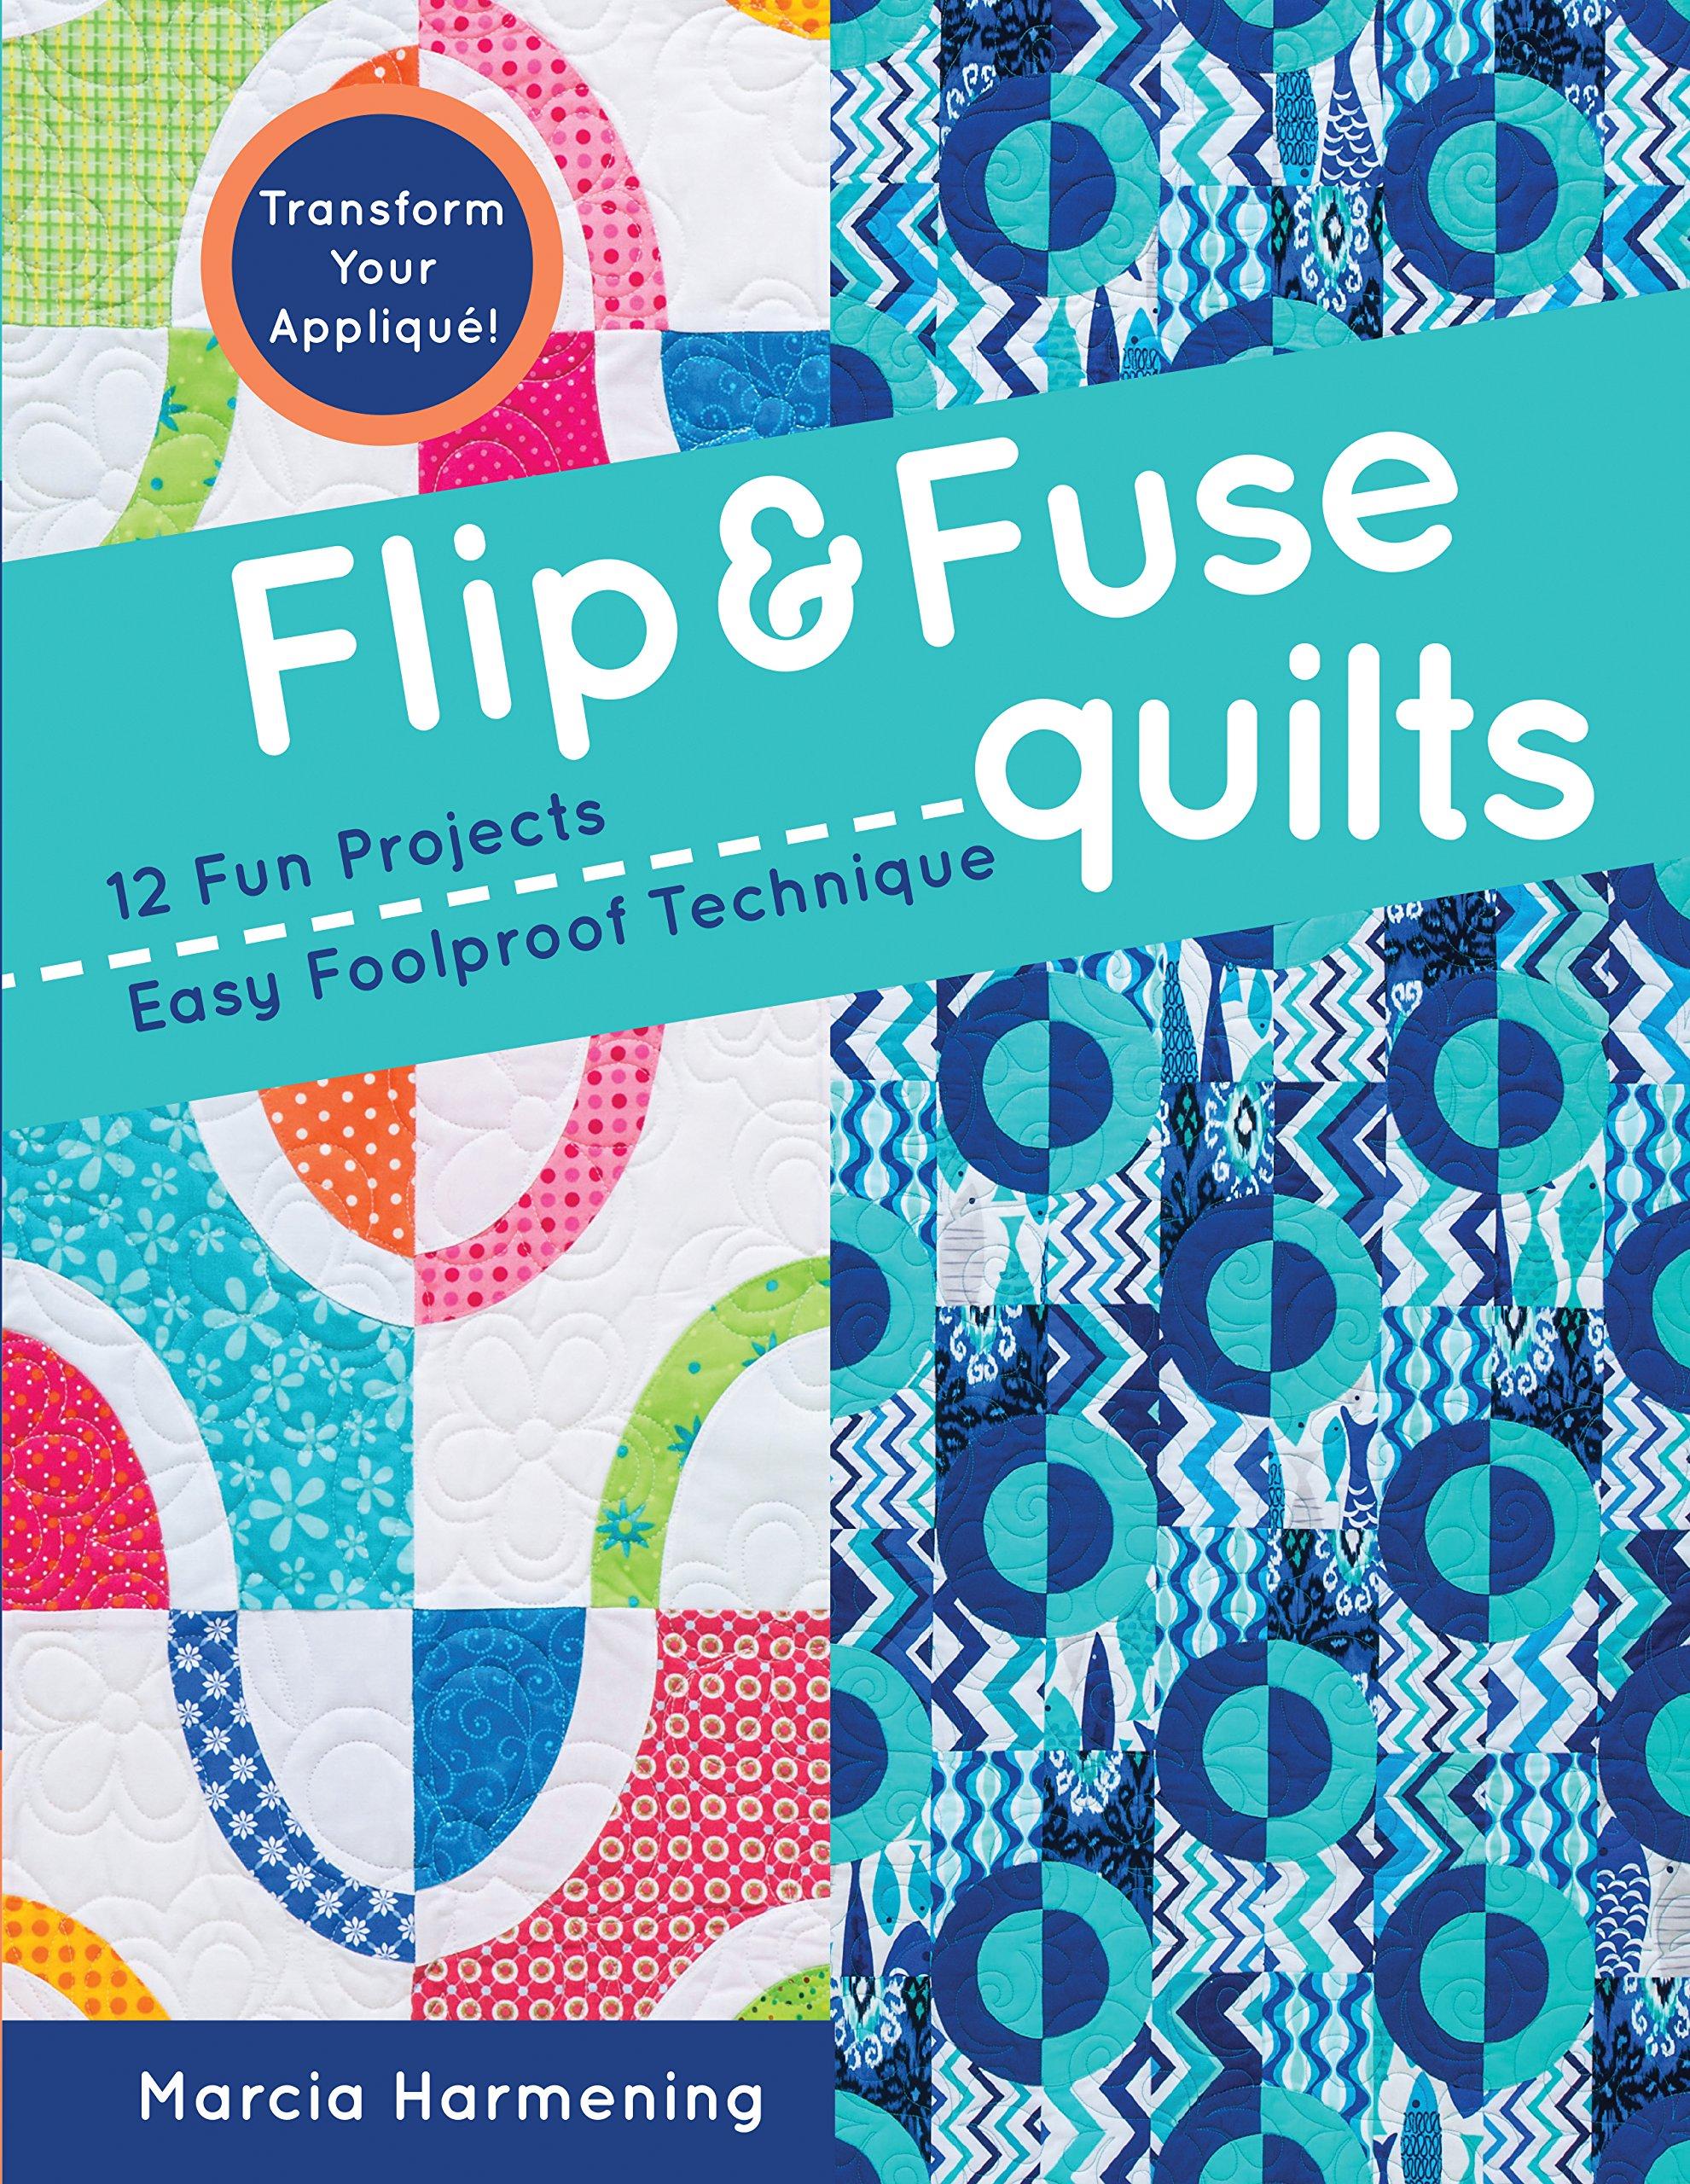 Applique Frog Quilt Pattern – Free Patterns